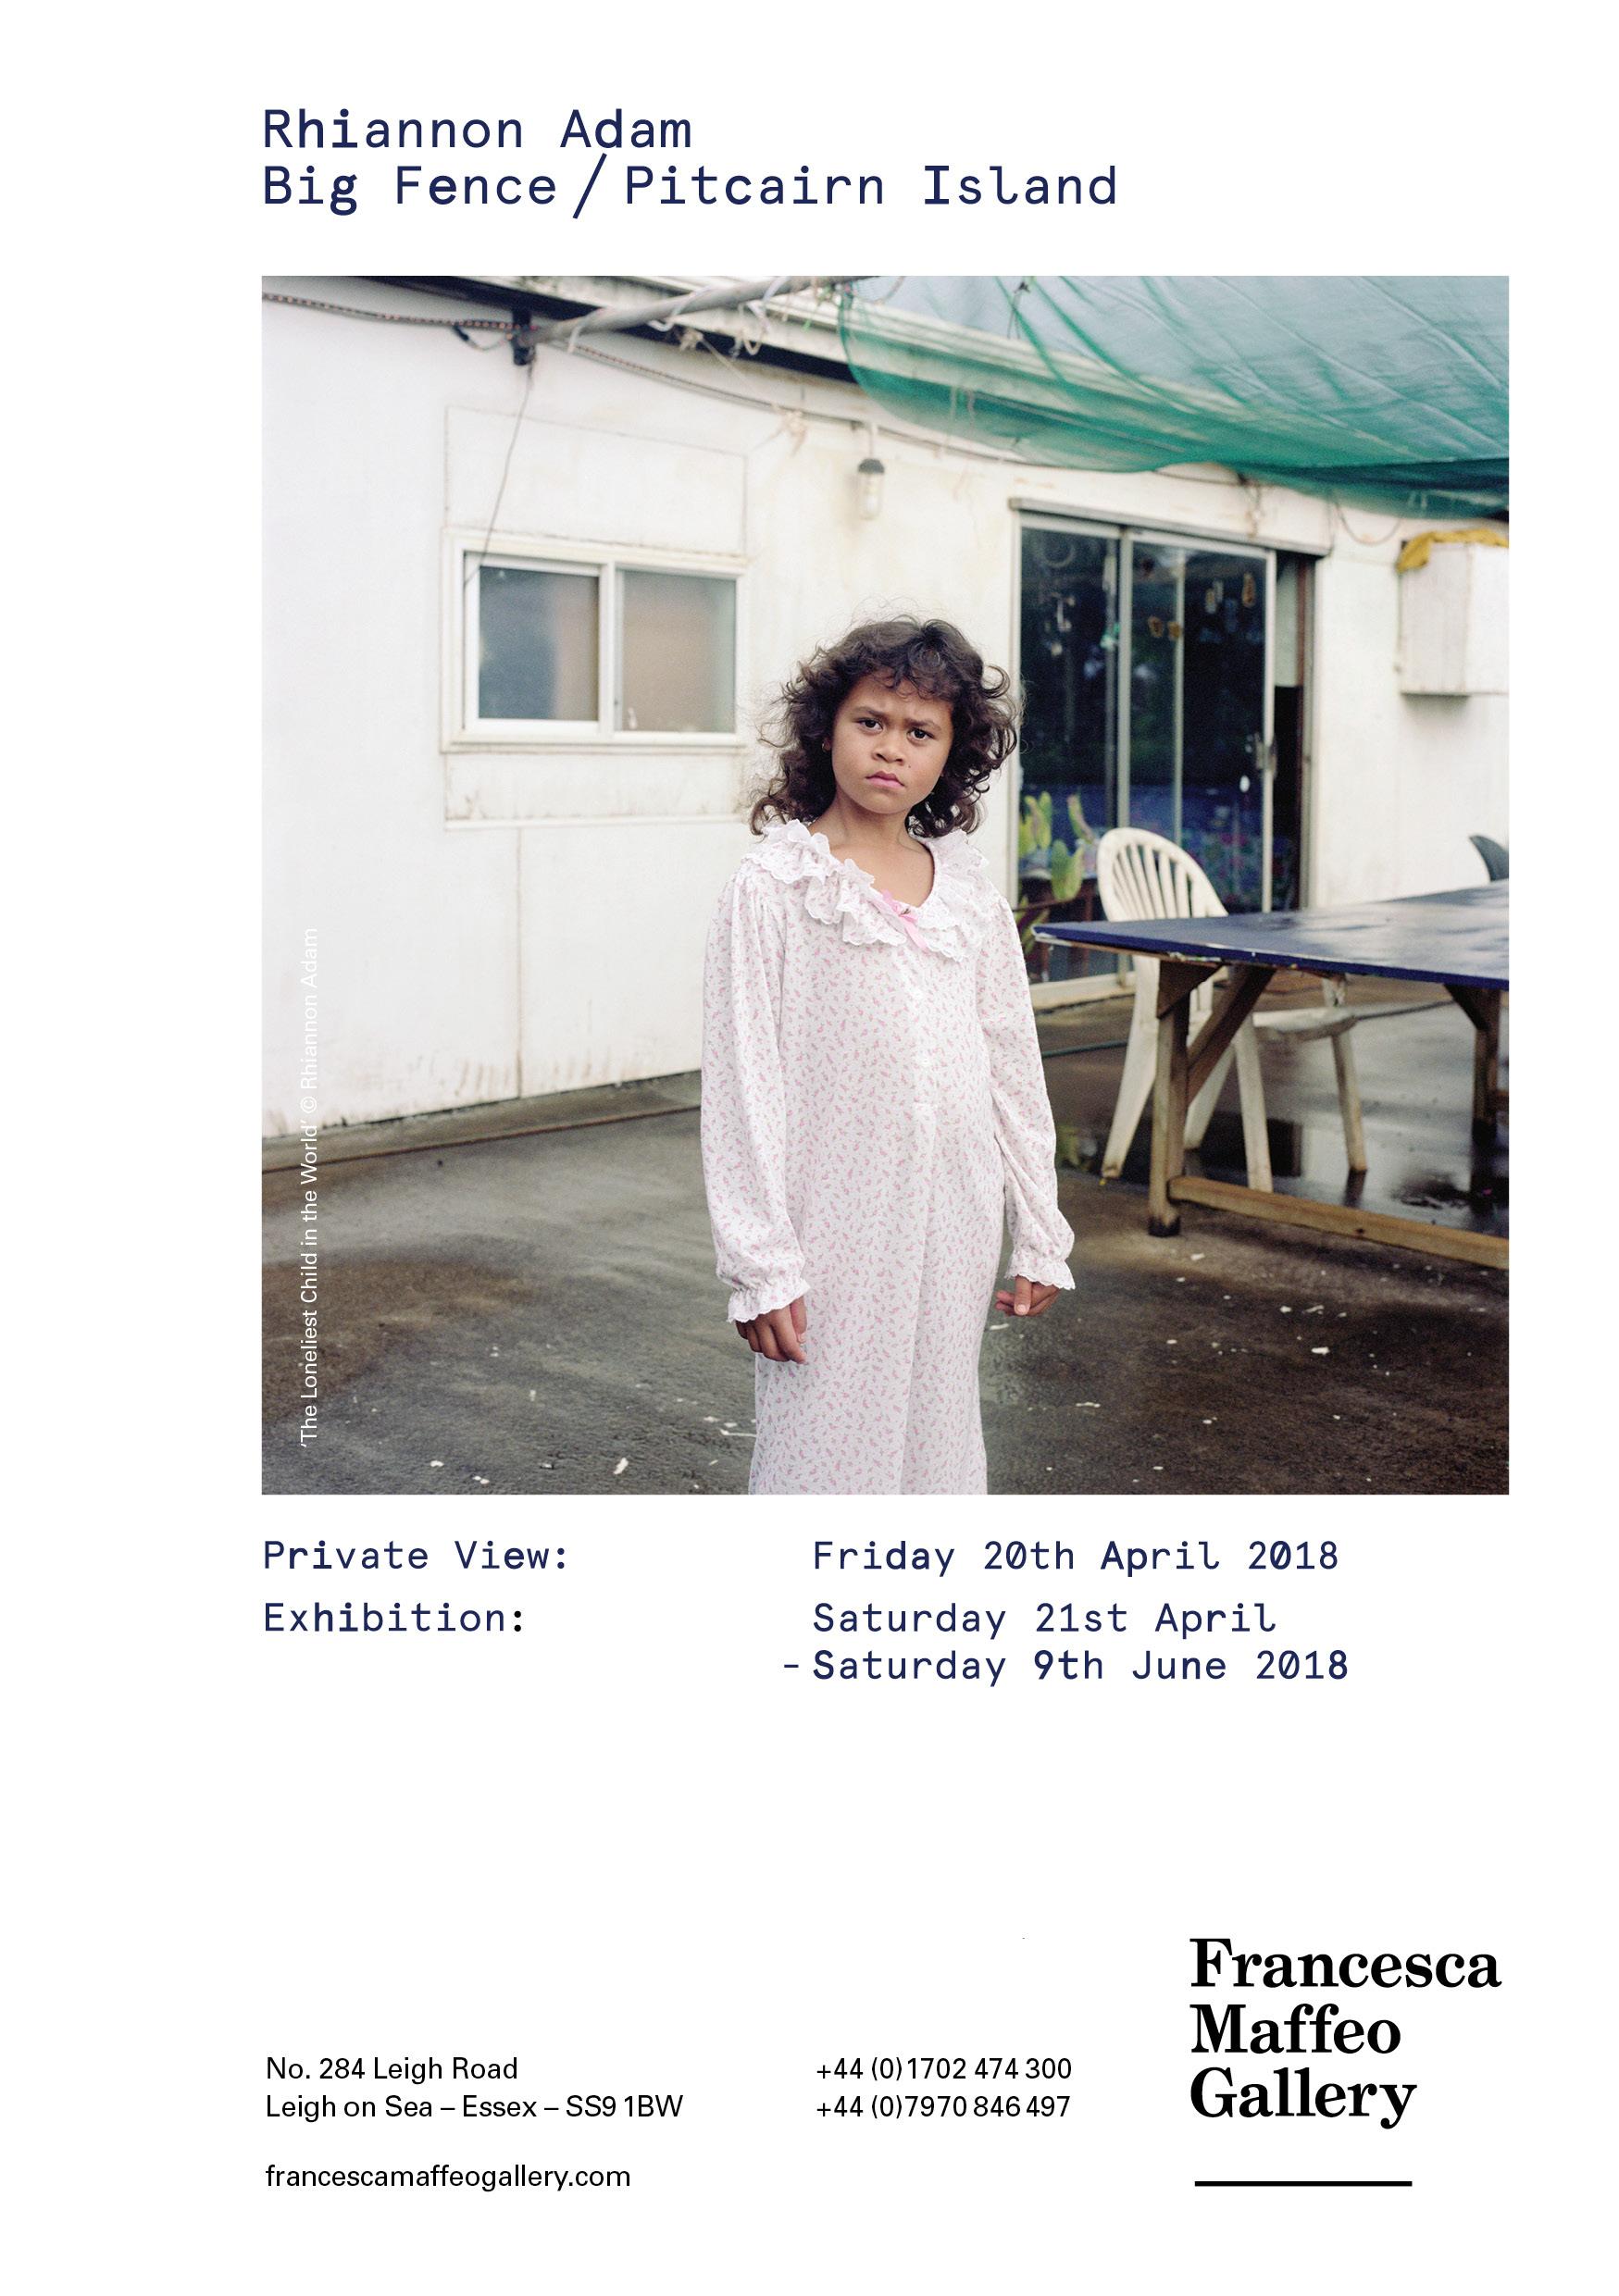 Rhiannon Adam | Big Fence / Pitcairn Island     Press Release      Print Sales